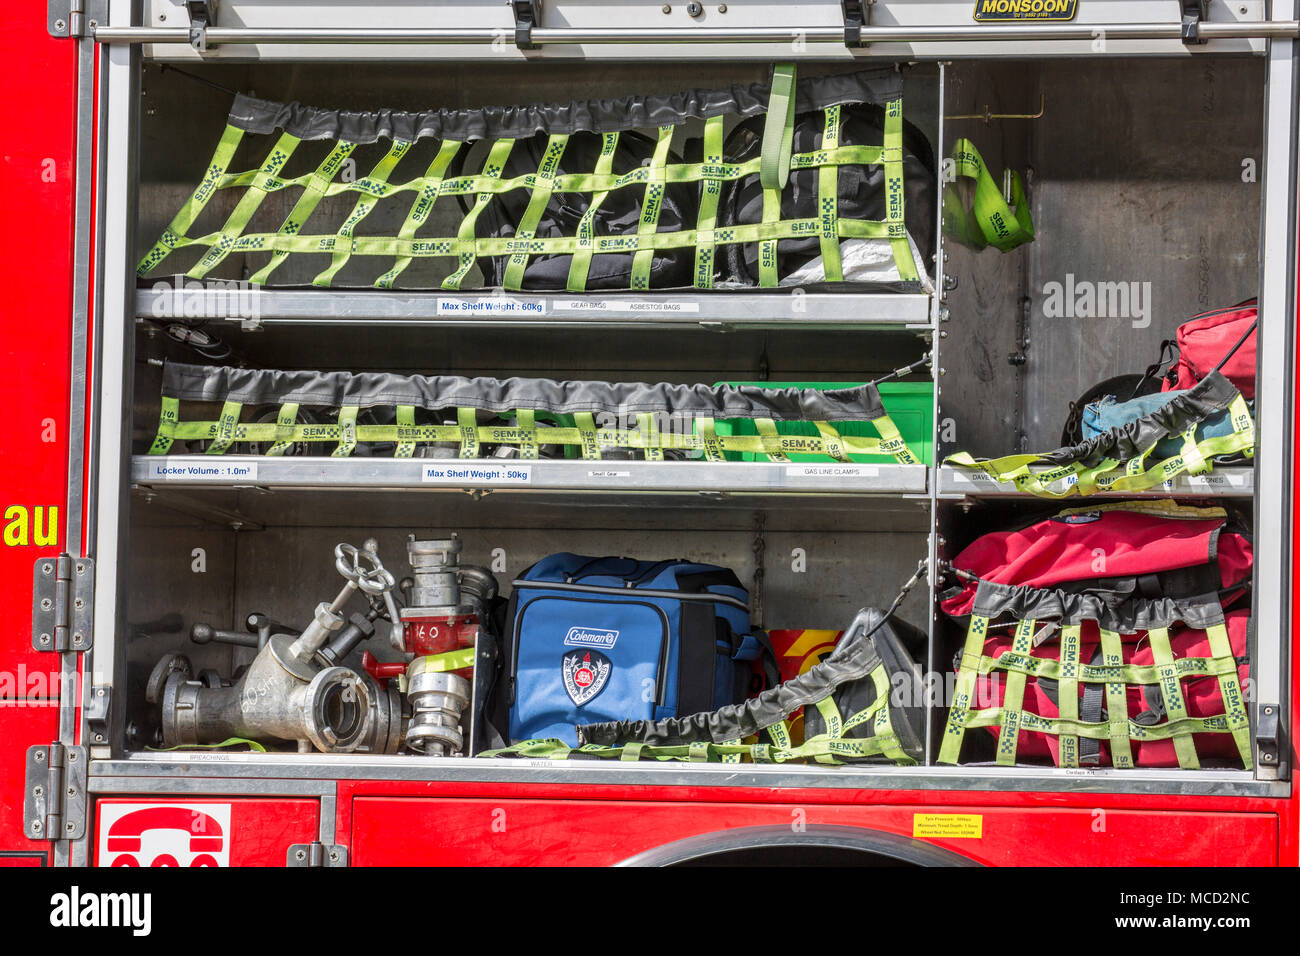 Equipment inside NSW fire tender truck in Sydney Stock Photo